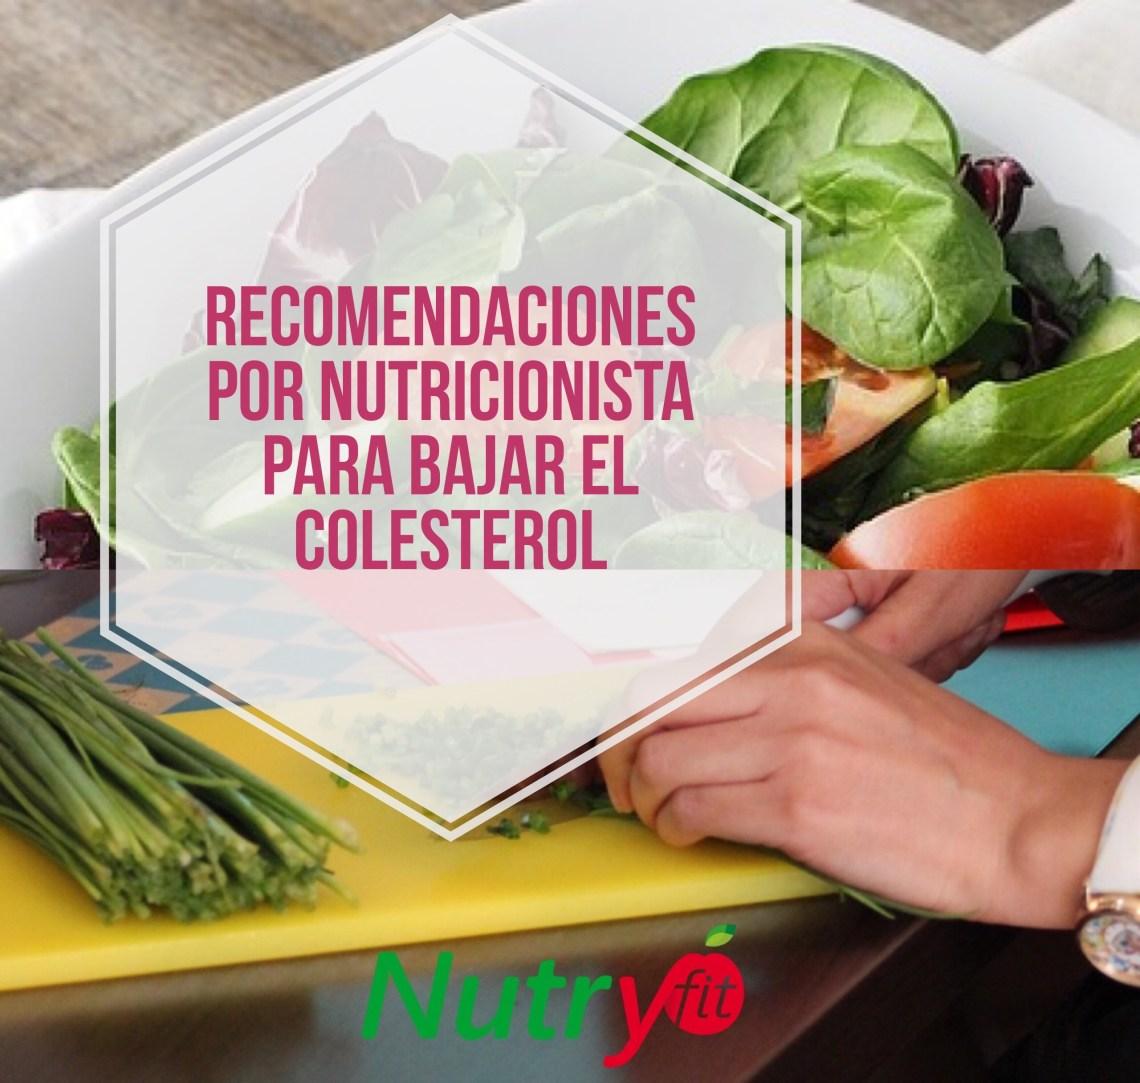 nutricionista Bogotá, nutricionista Diana Rojas, nutryfit. nutricionista. mejor nutricionista, diana rojas nutricionista